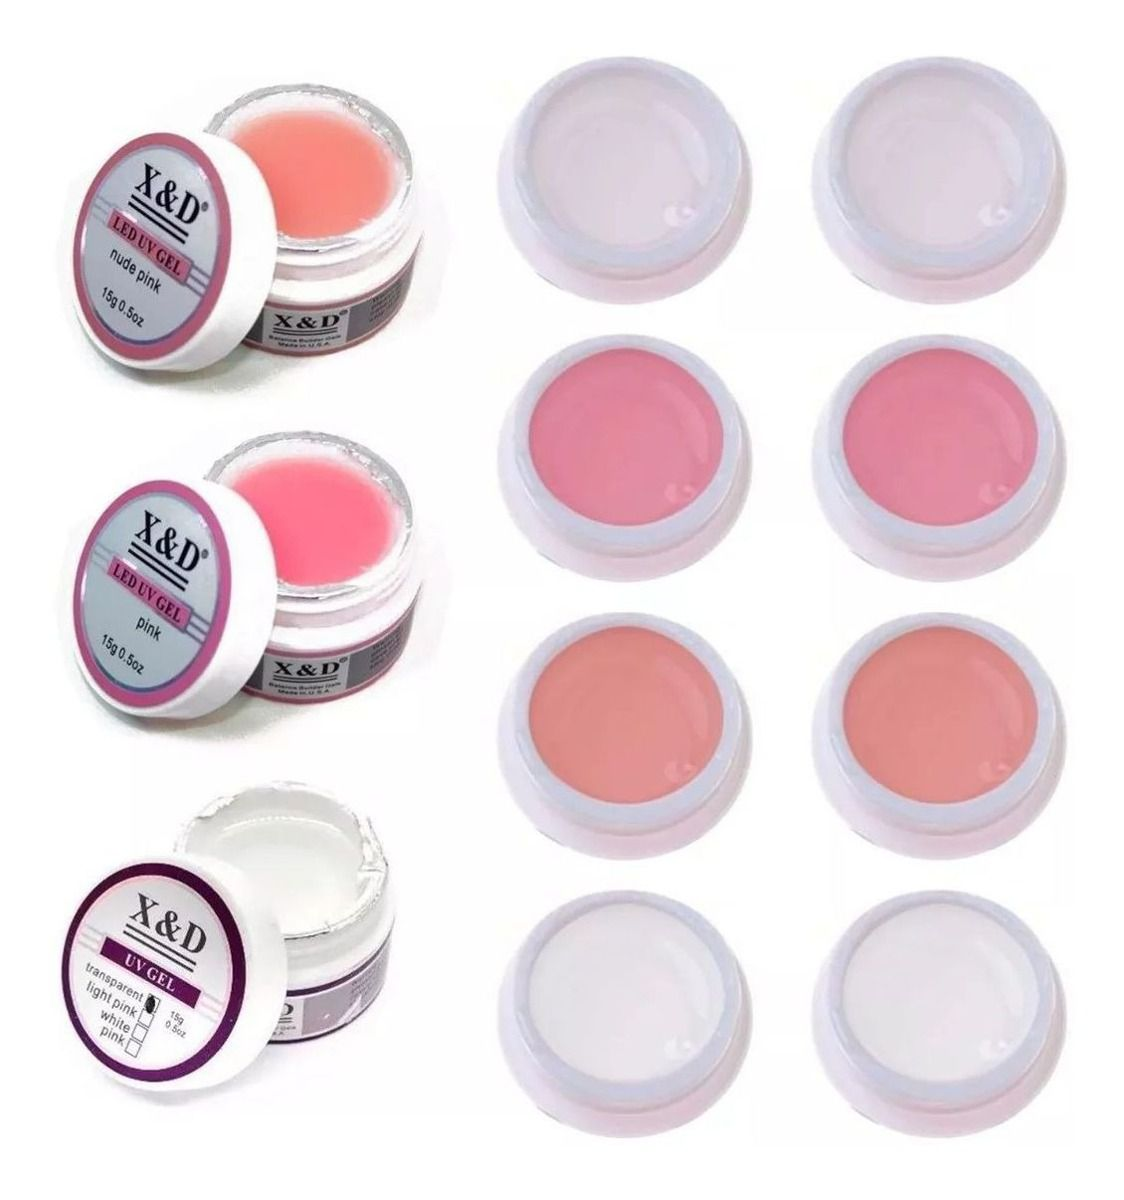 Gel Led UV  X&D 15g acrigel Pink